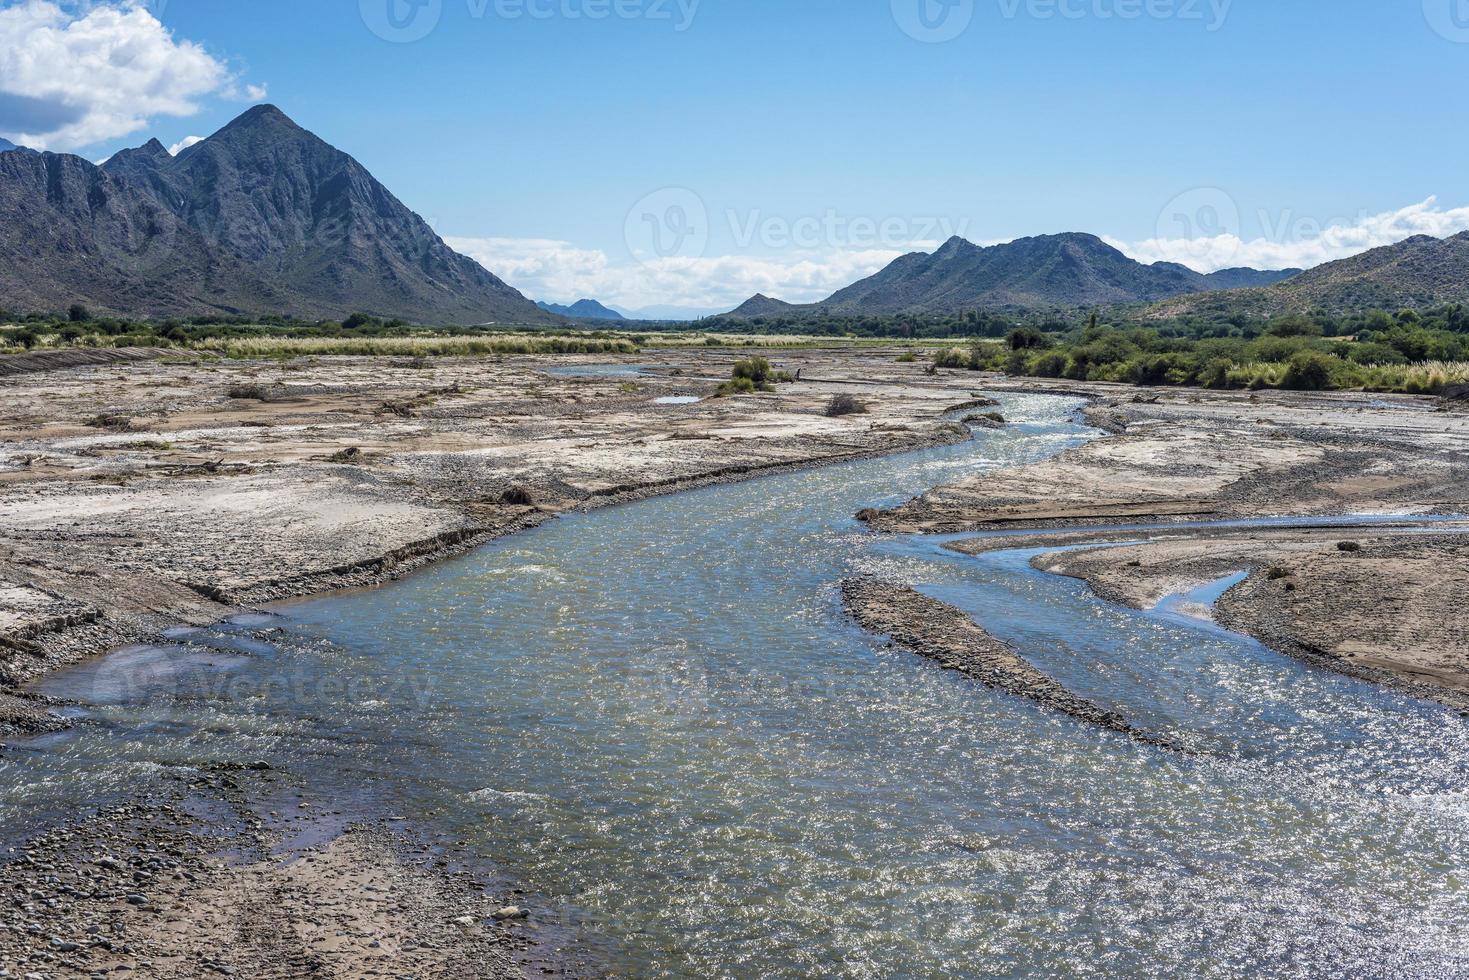 seclantas en la provincia de salta, argentina. foto